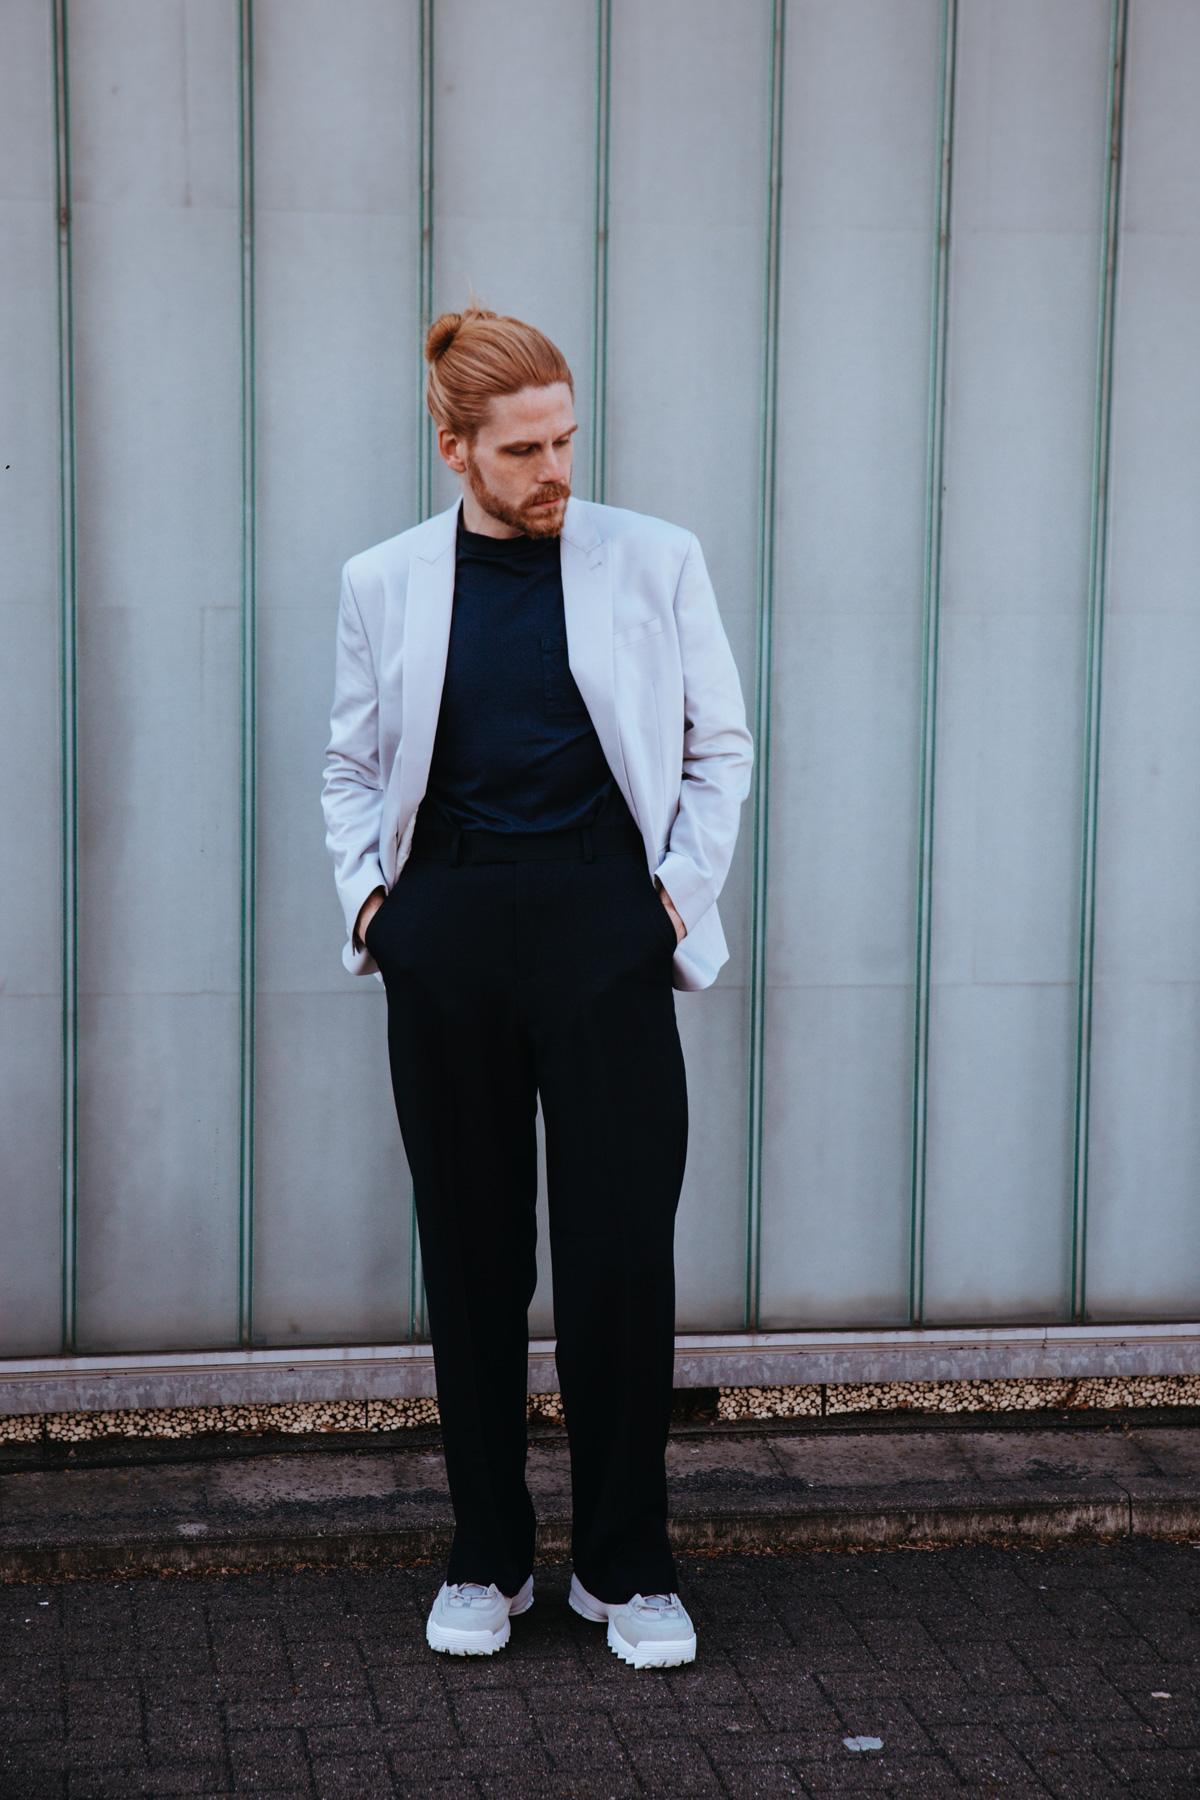 Modern-Malefashion-Sakko-Fila-Disruptor-Style-Influencer-Ginger